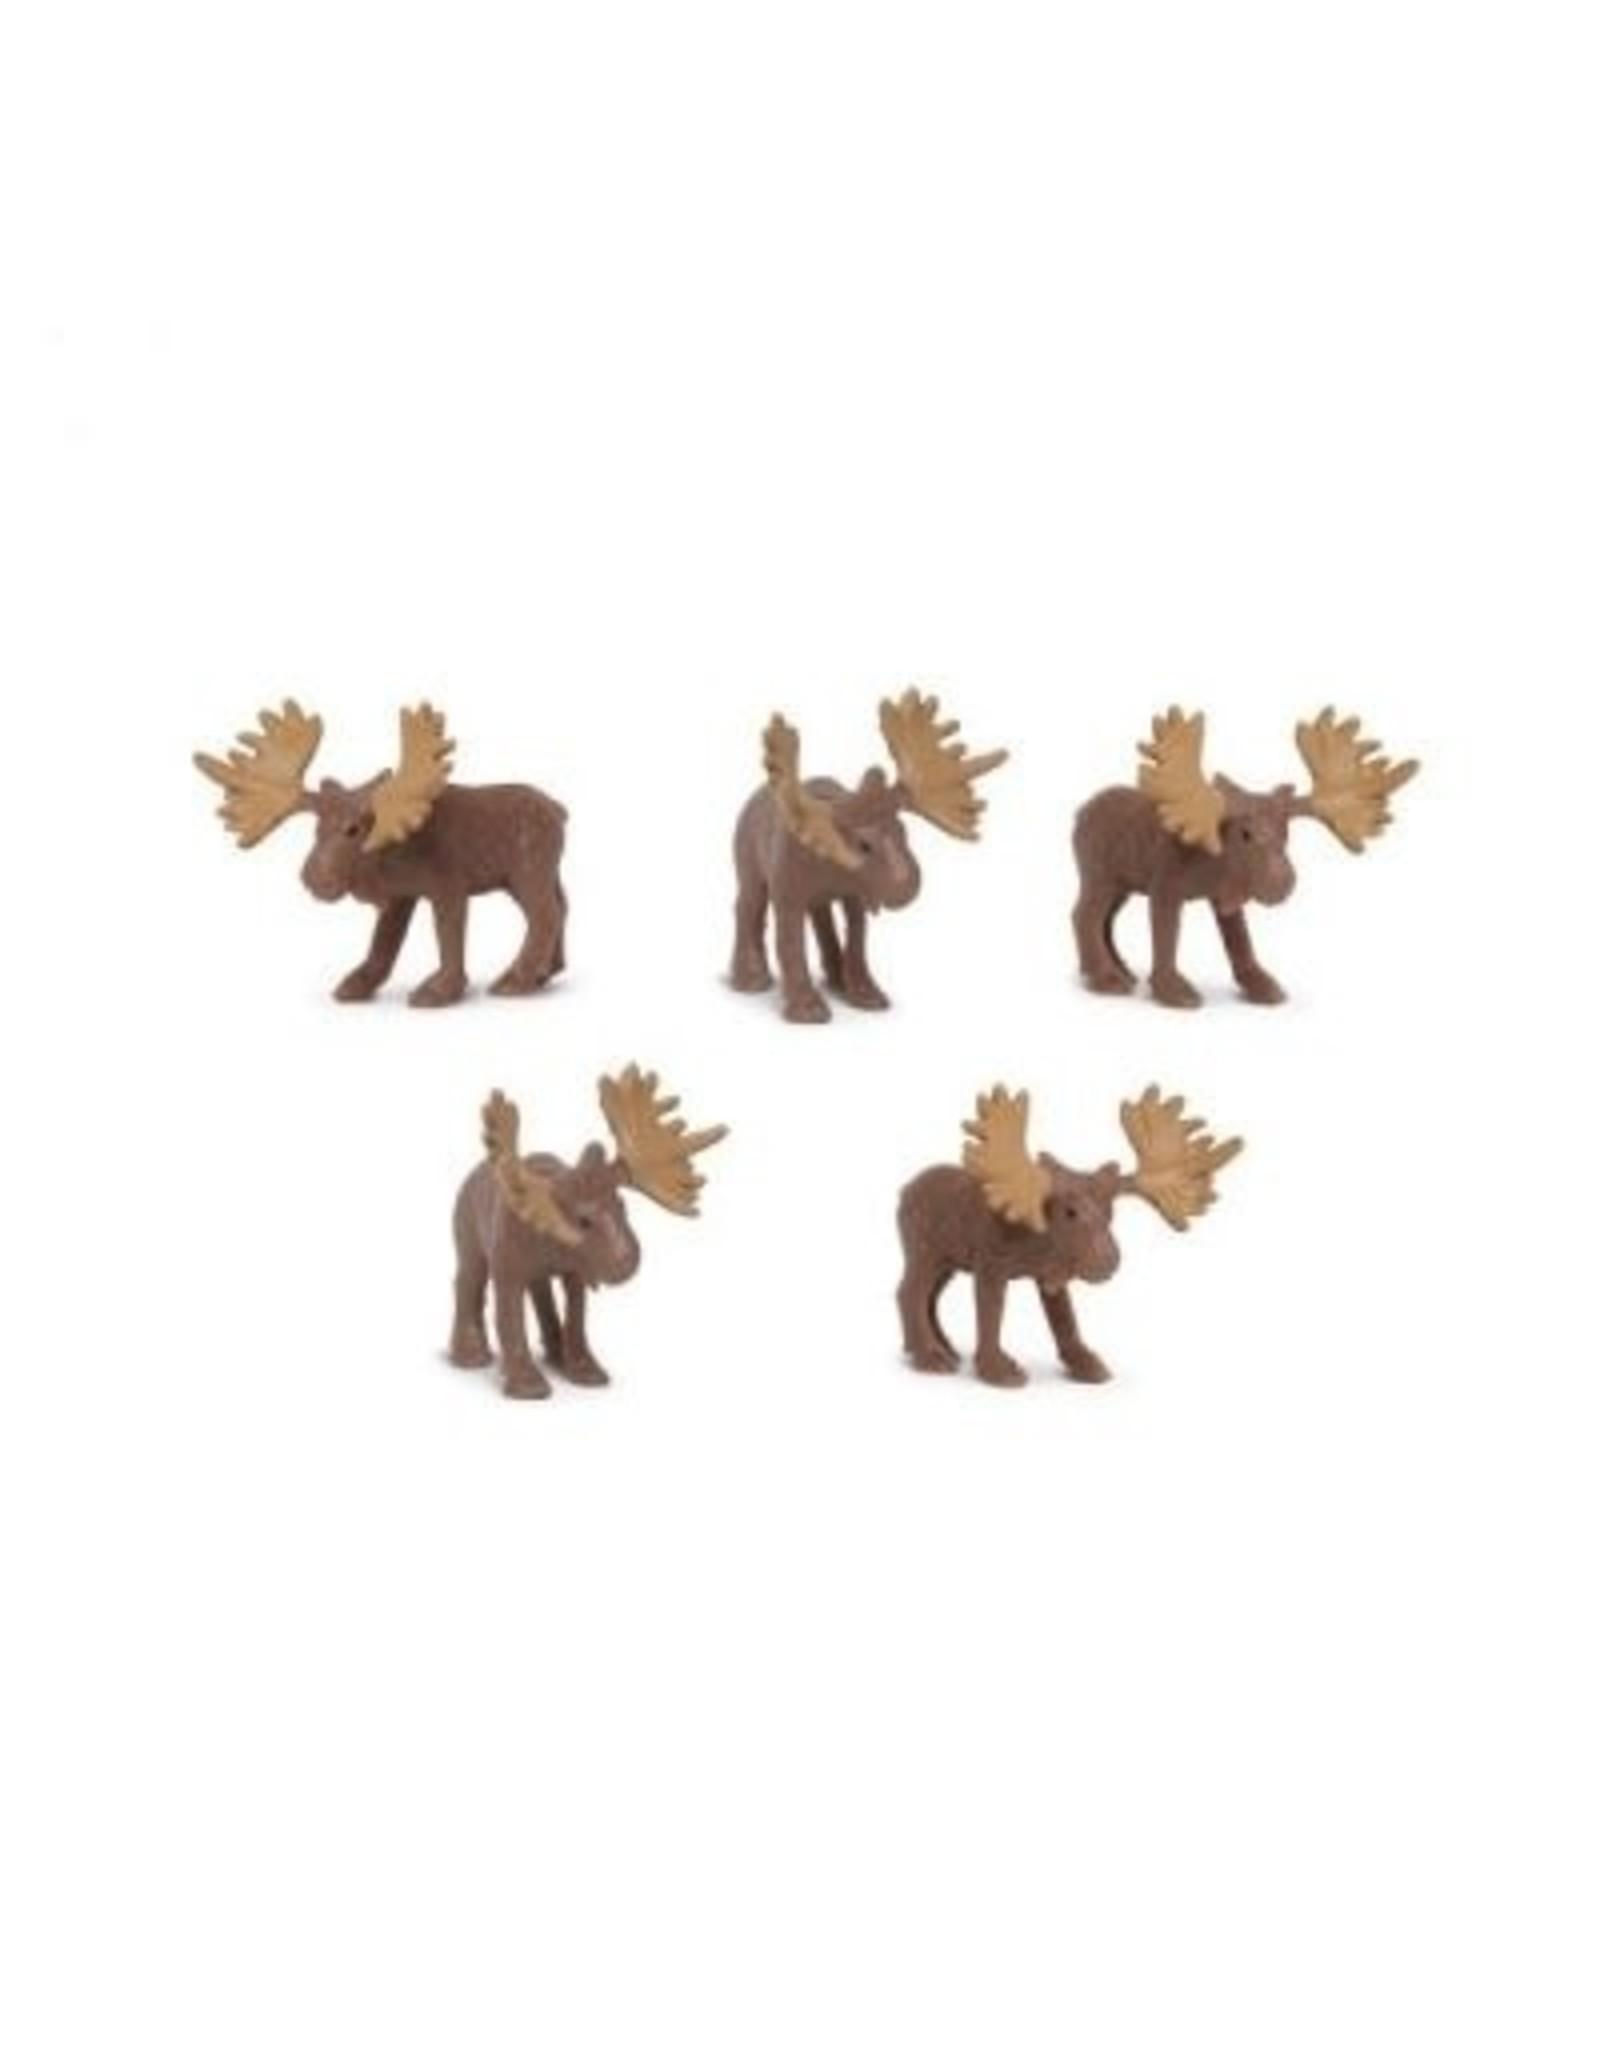 Goodluck mini - moose